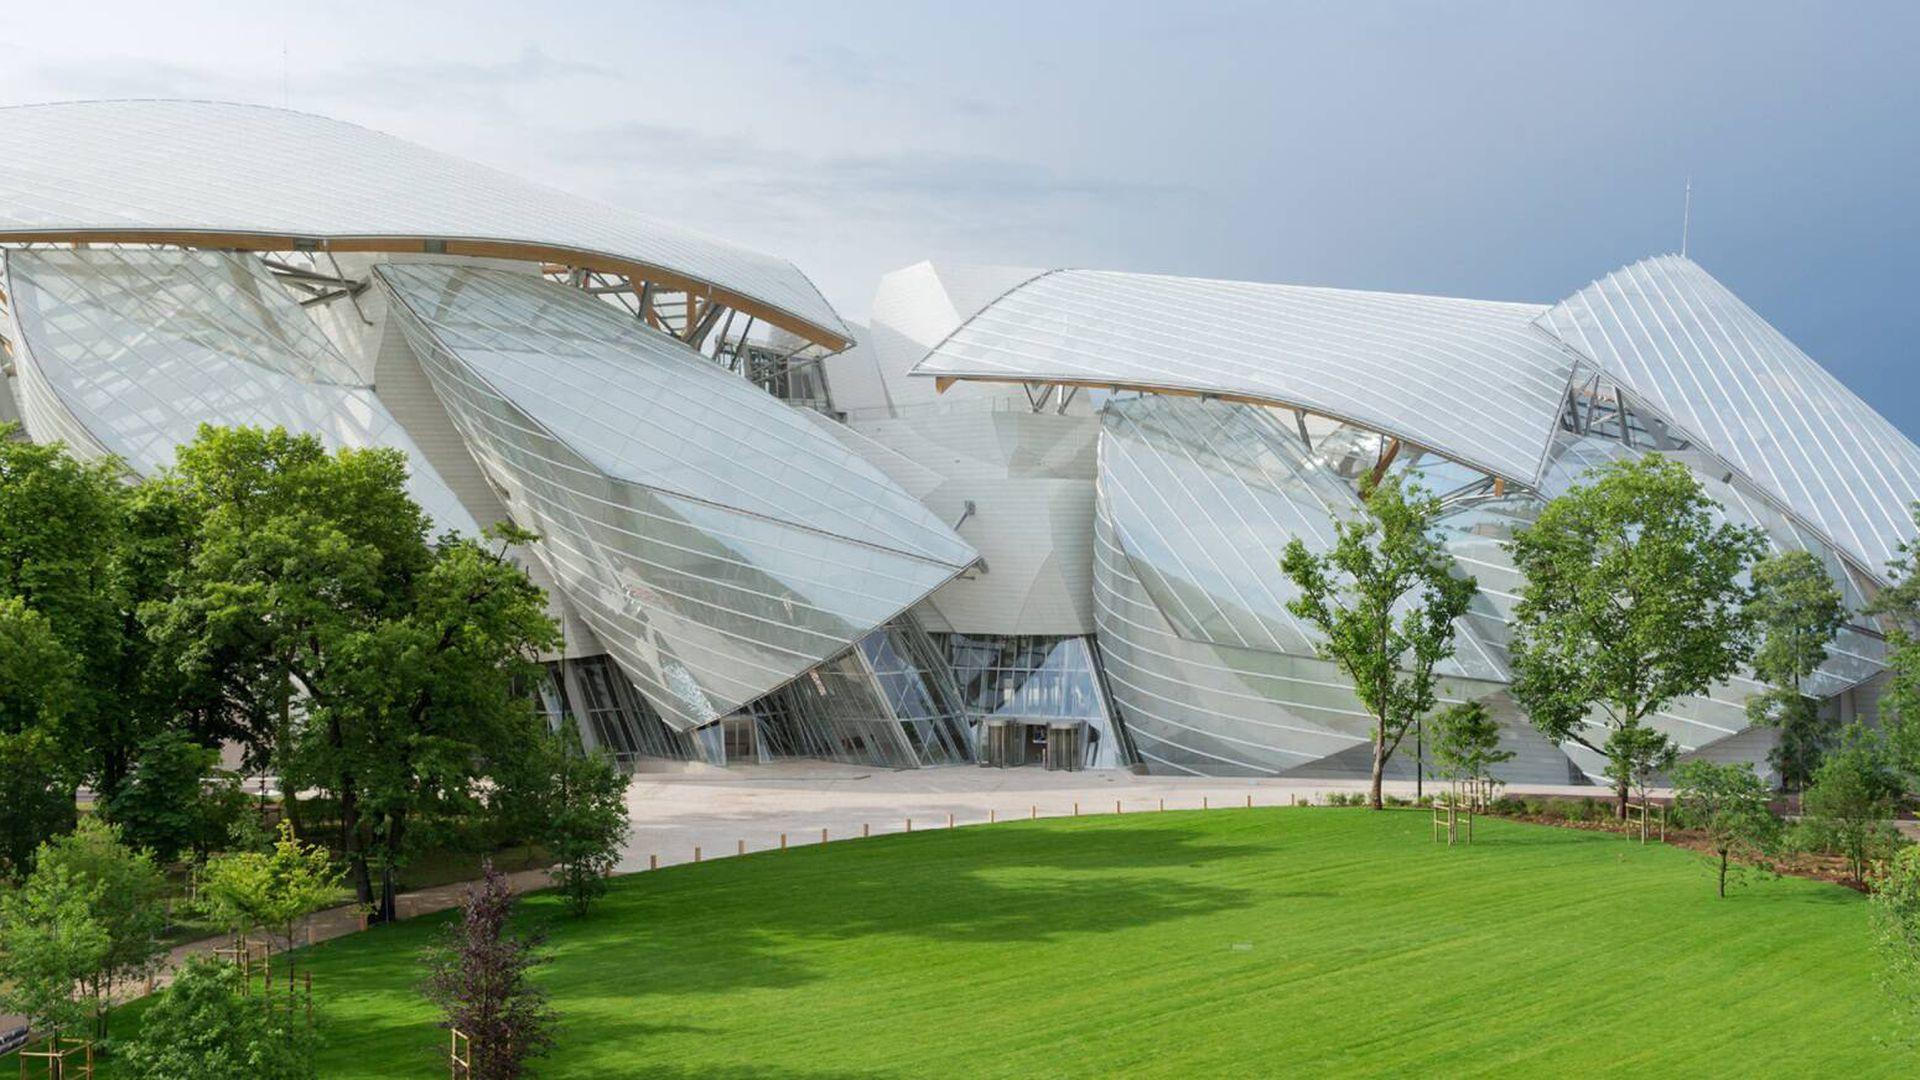 Louis Vuitton Foundation: Ticket & Audio Tour